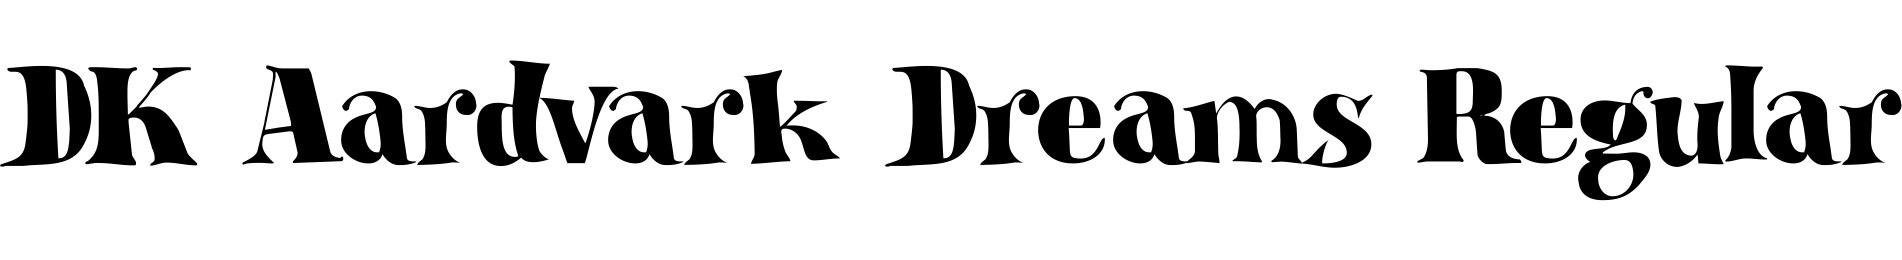 DK Aardvark Dreams Regular